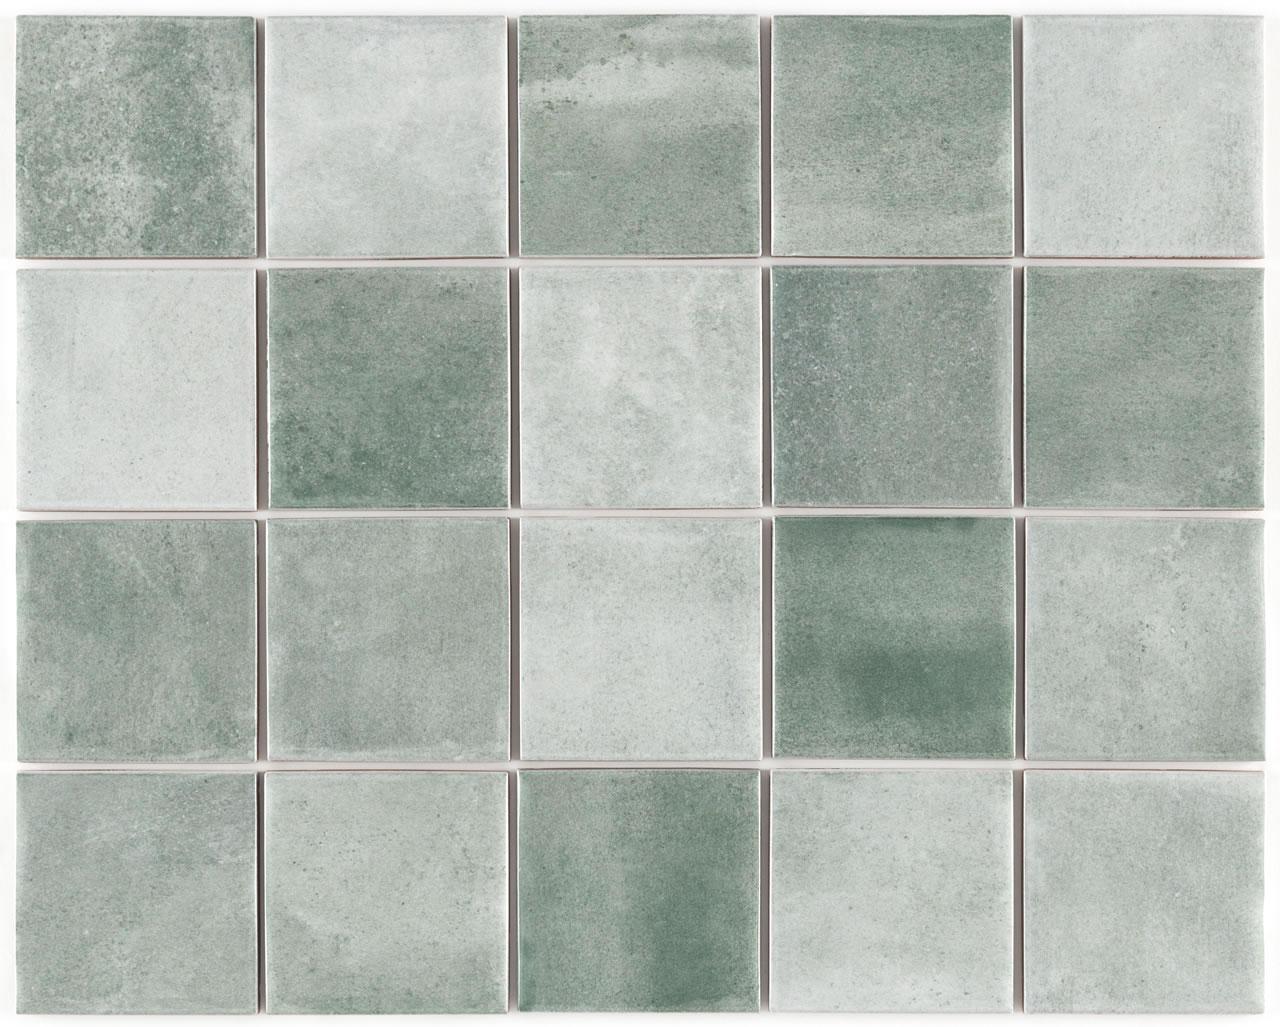 Noronha green mesh br 7.5×7,5